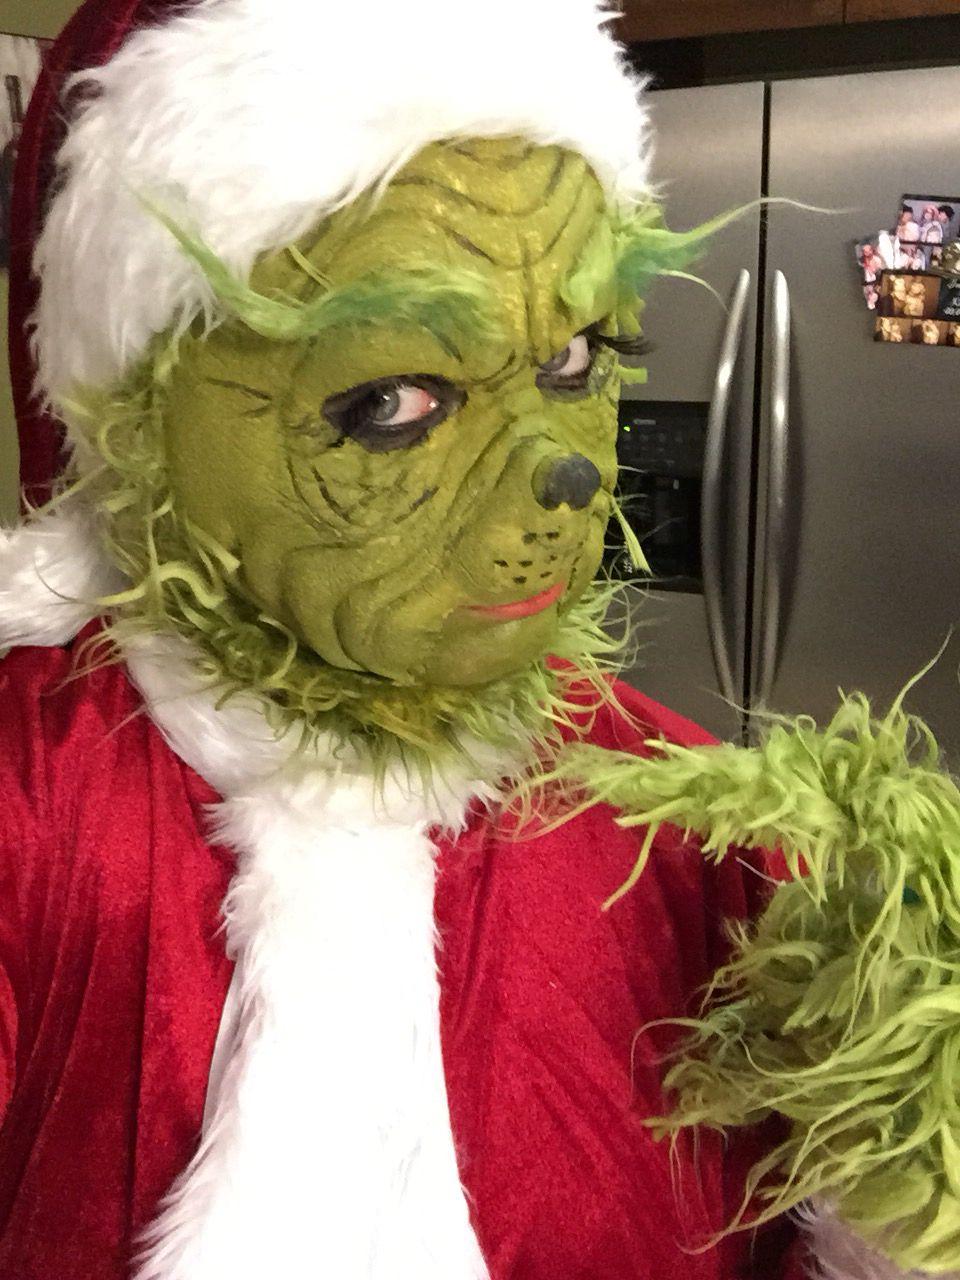 The grinch Halloween costume Christmas diy homemade